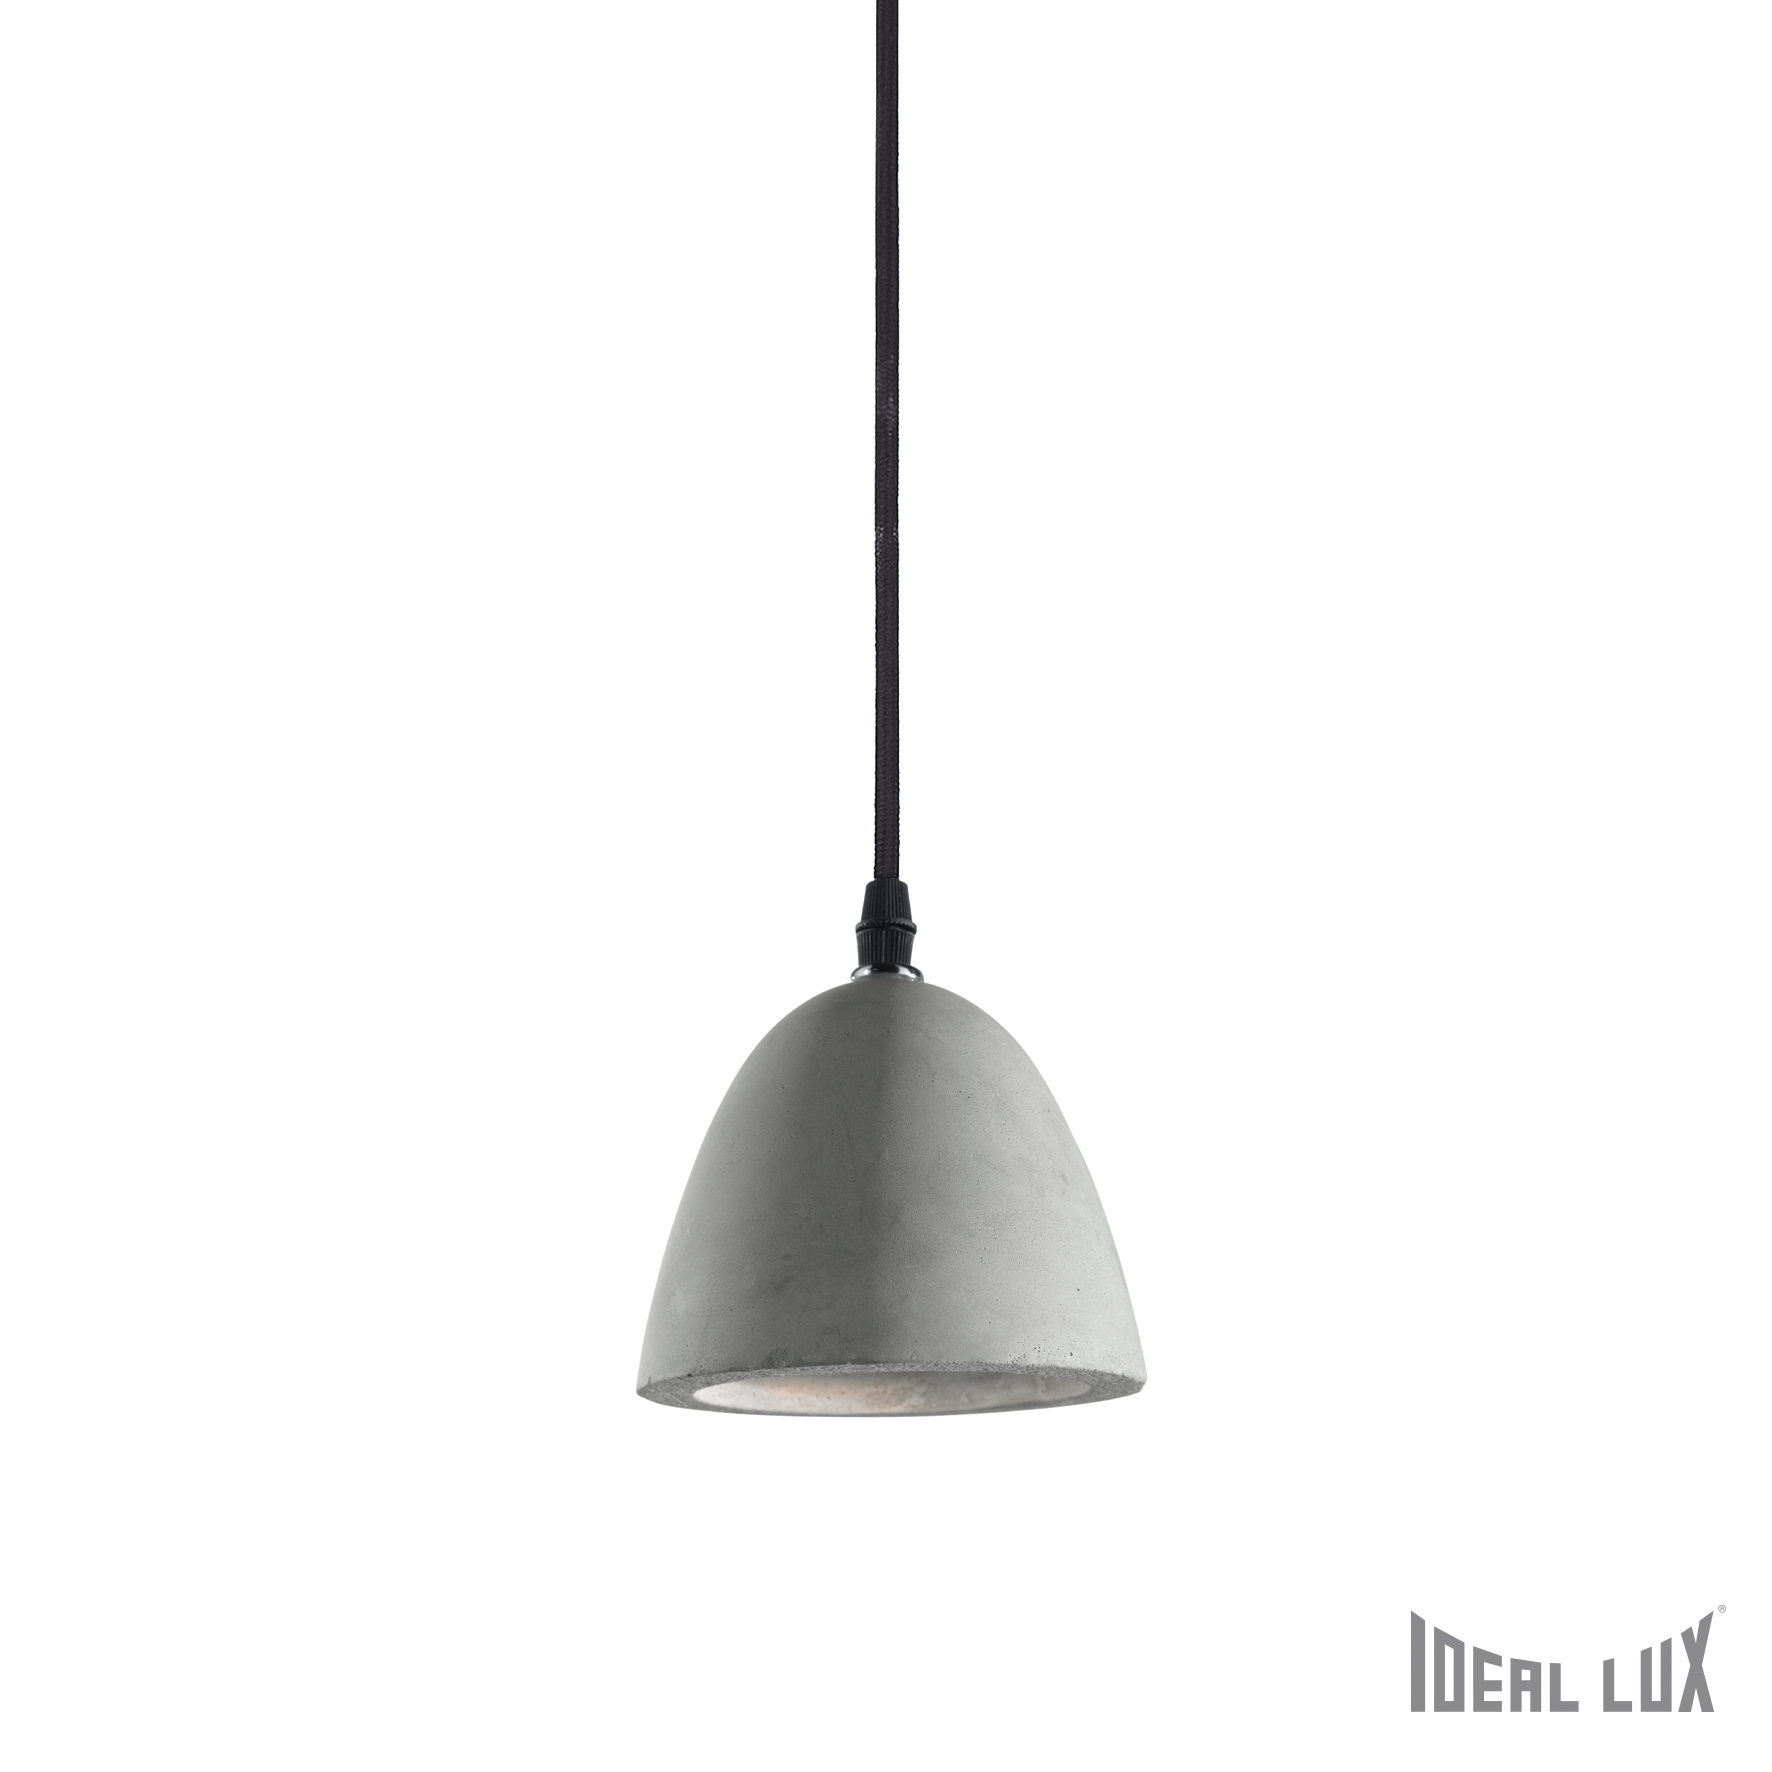 Lustra Oil-4 SP1